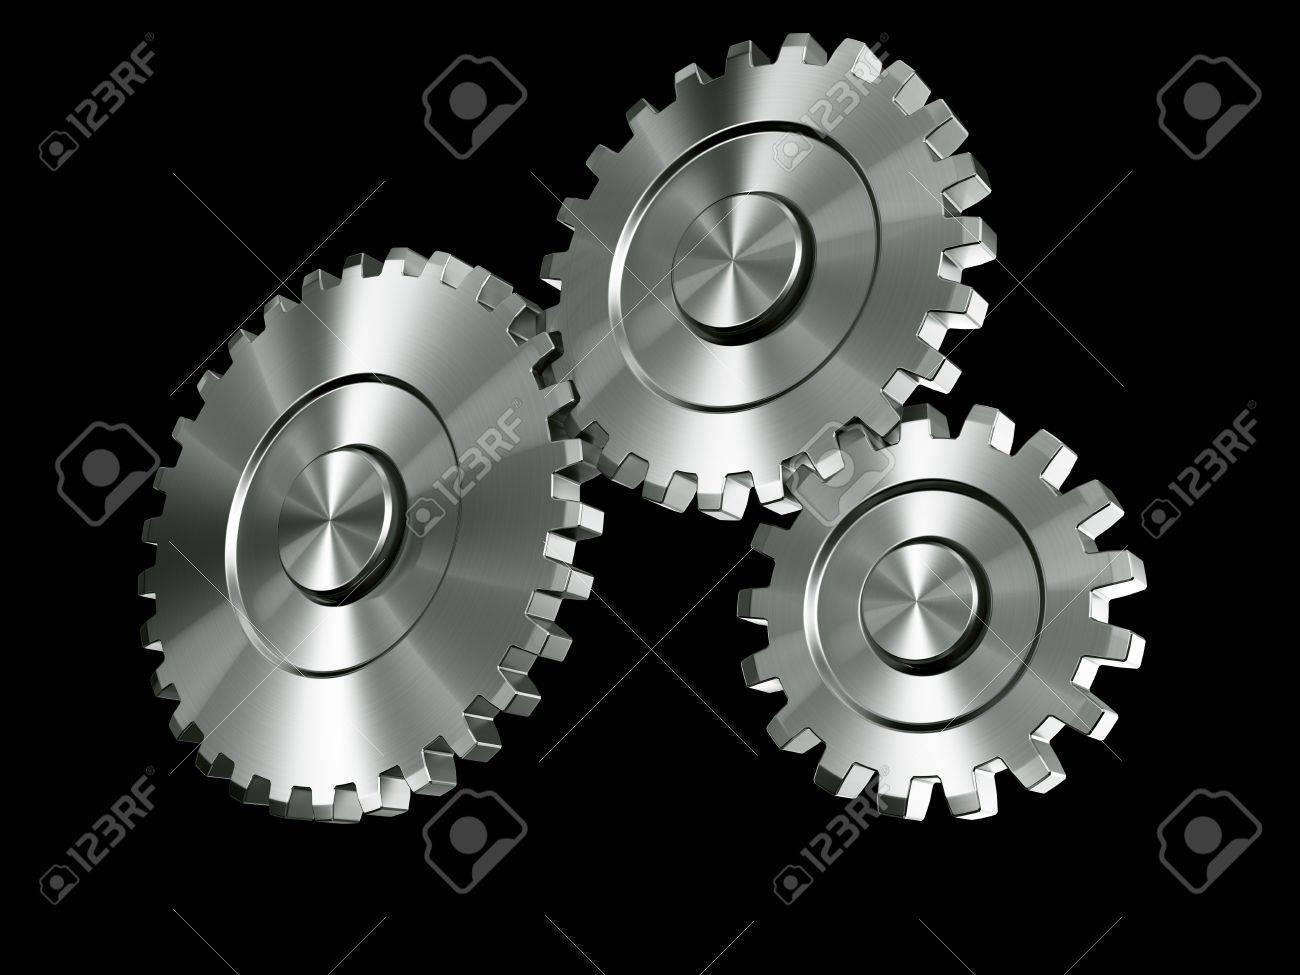 3d rendering of 3 gears Stock Photo - 3279383